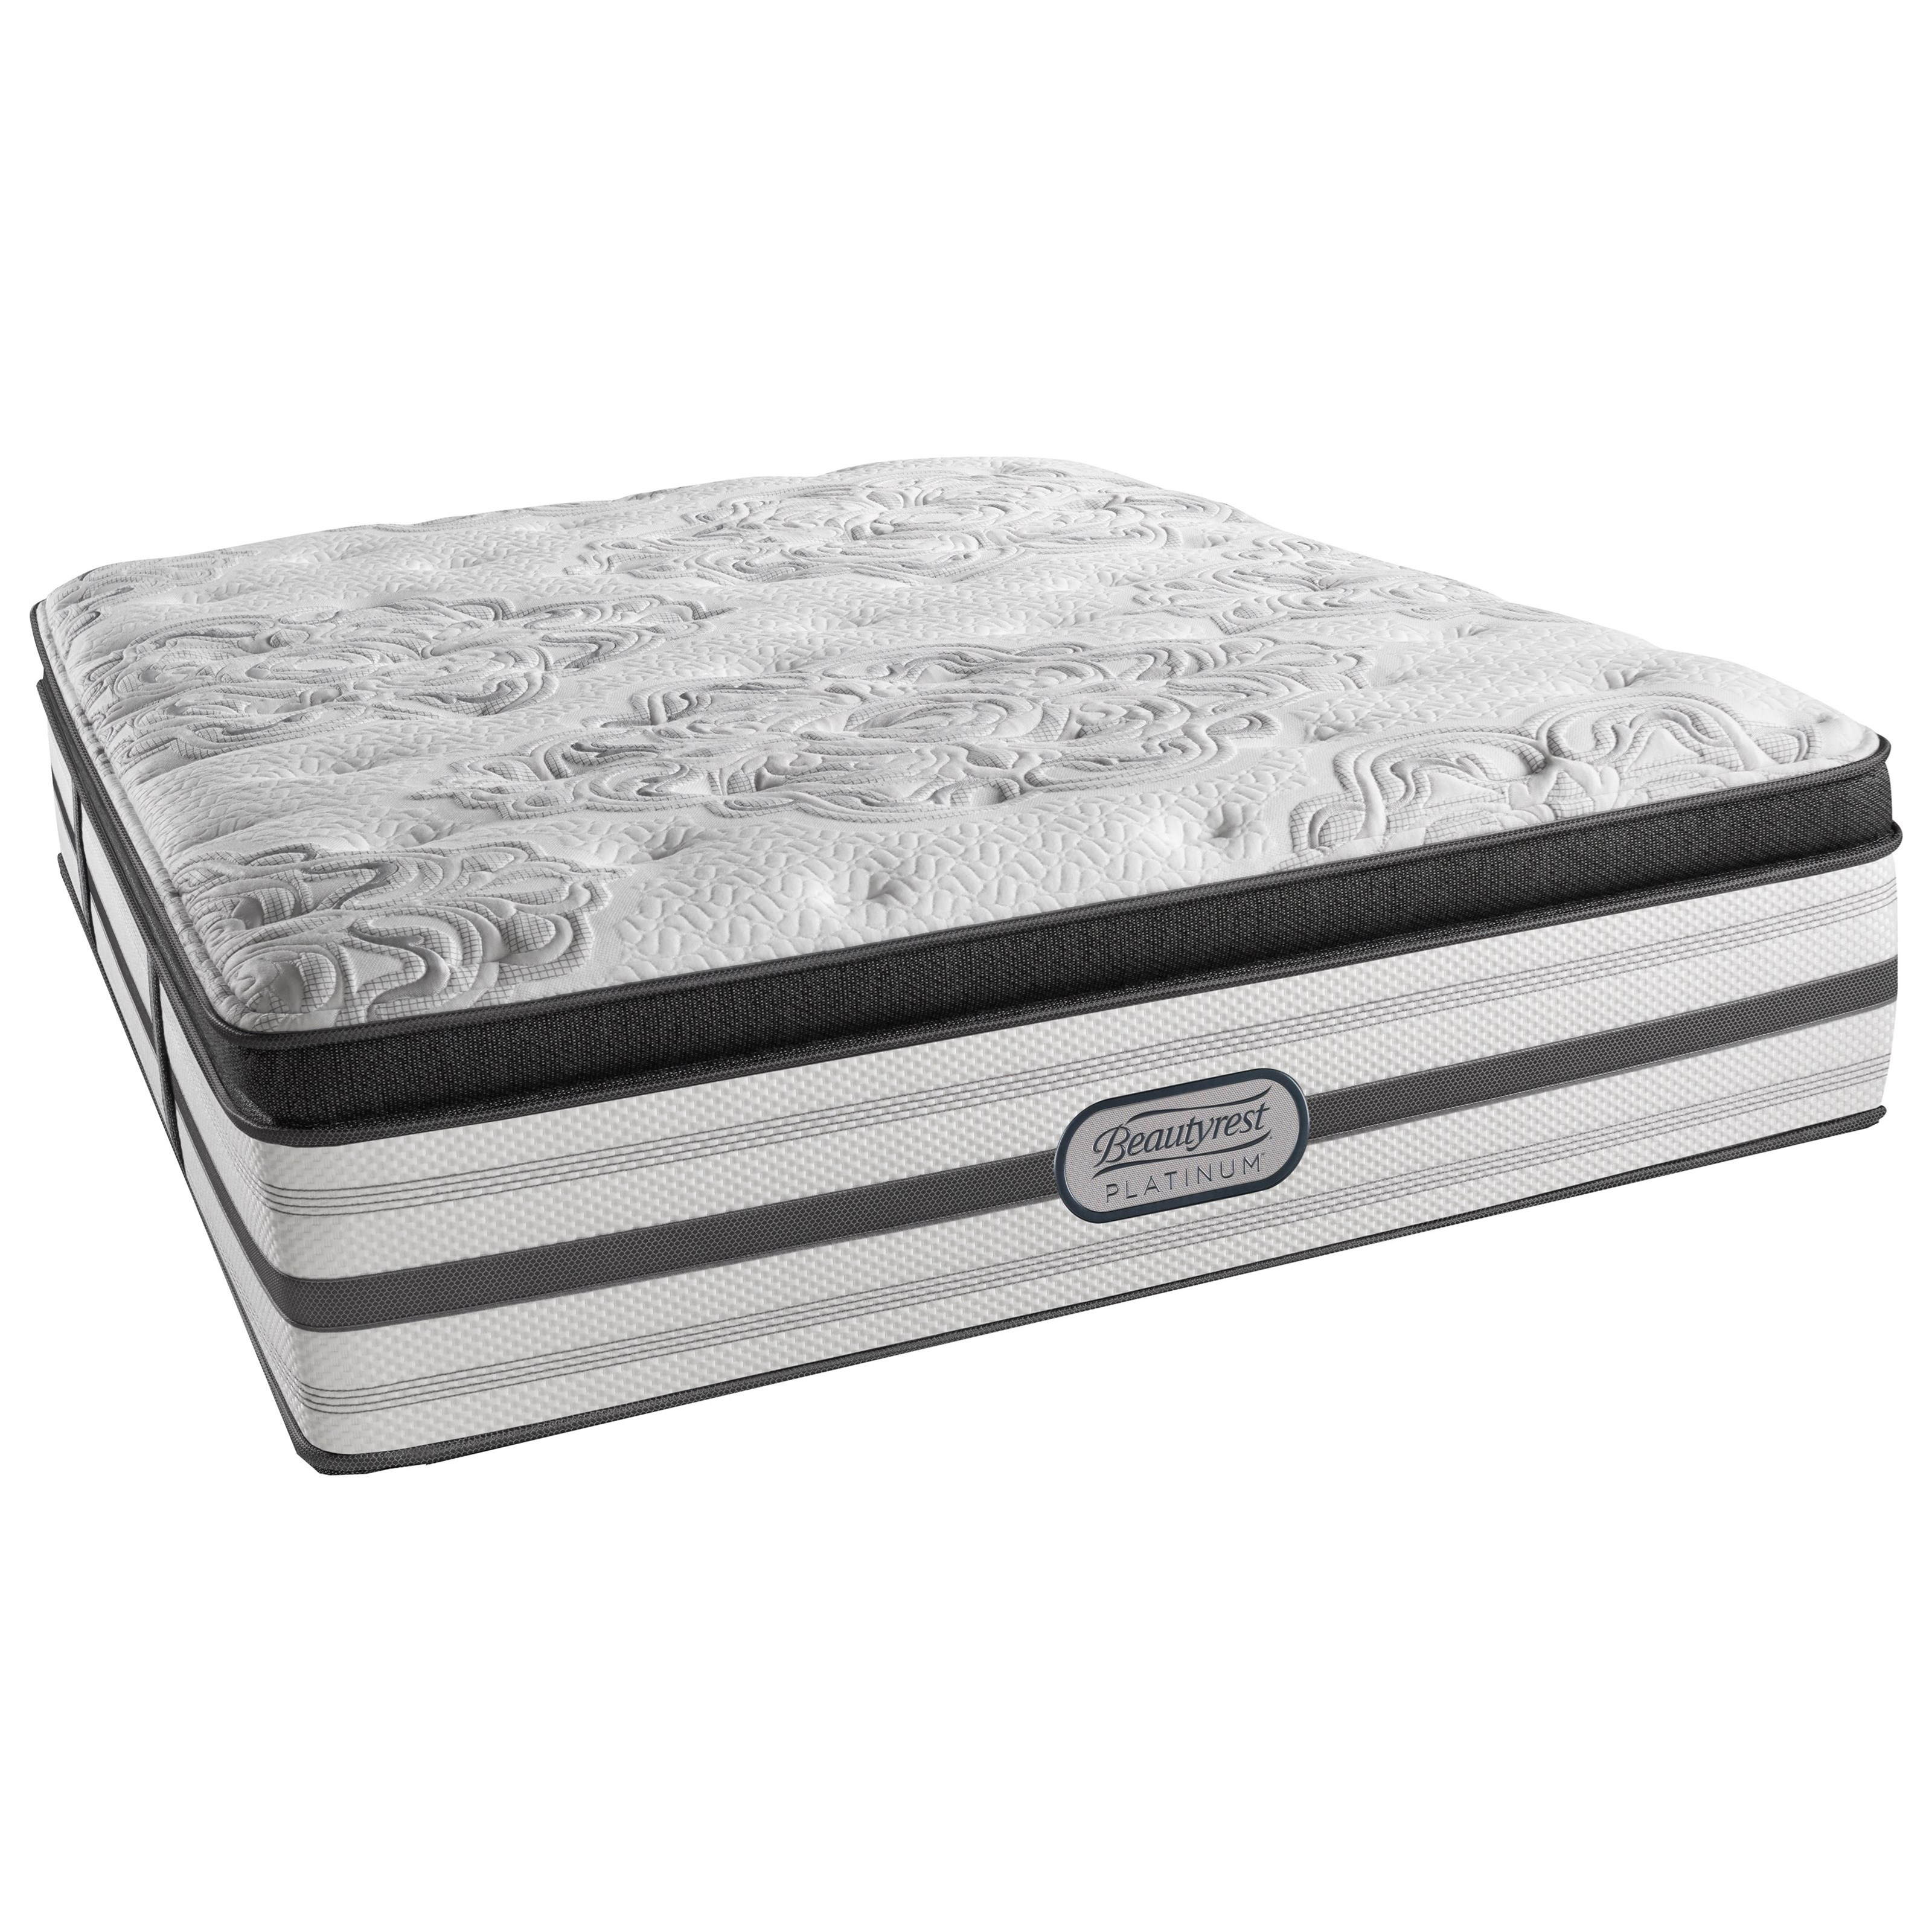 Beautyrest Platinum Katherine Cal King Plush Box Top Mattress - Item Number: LV4PLBT-CK